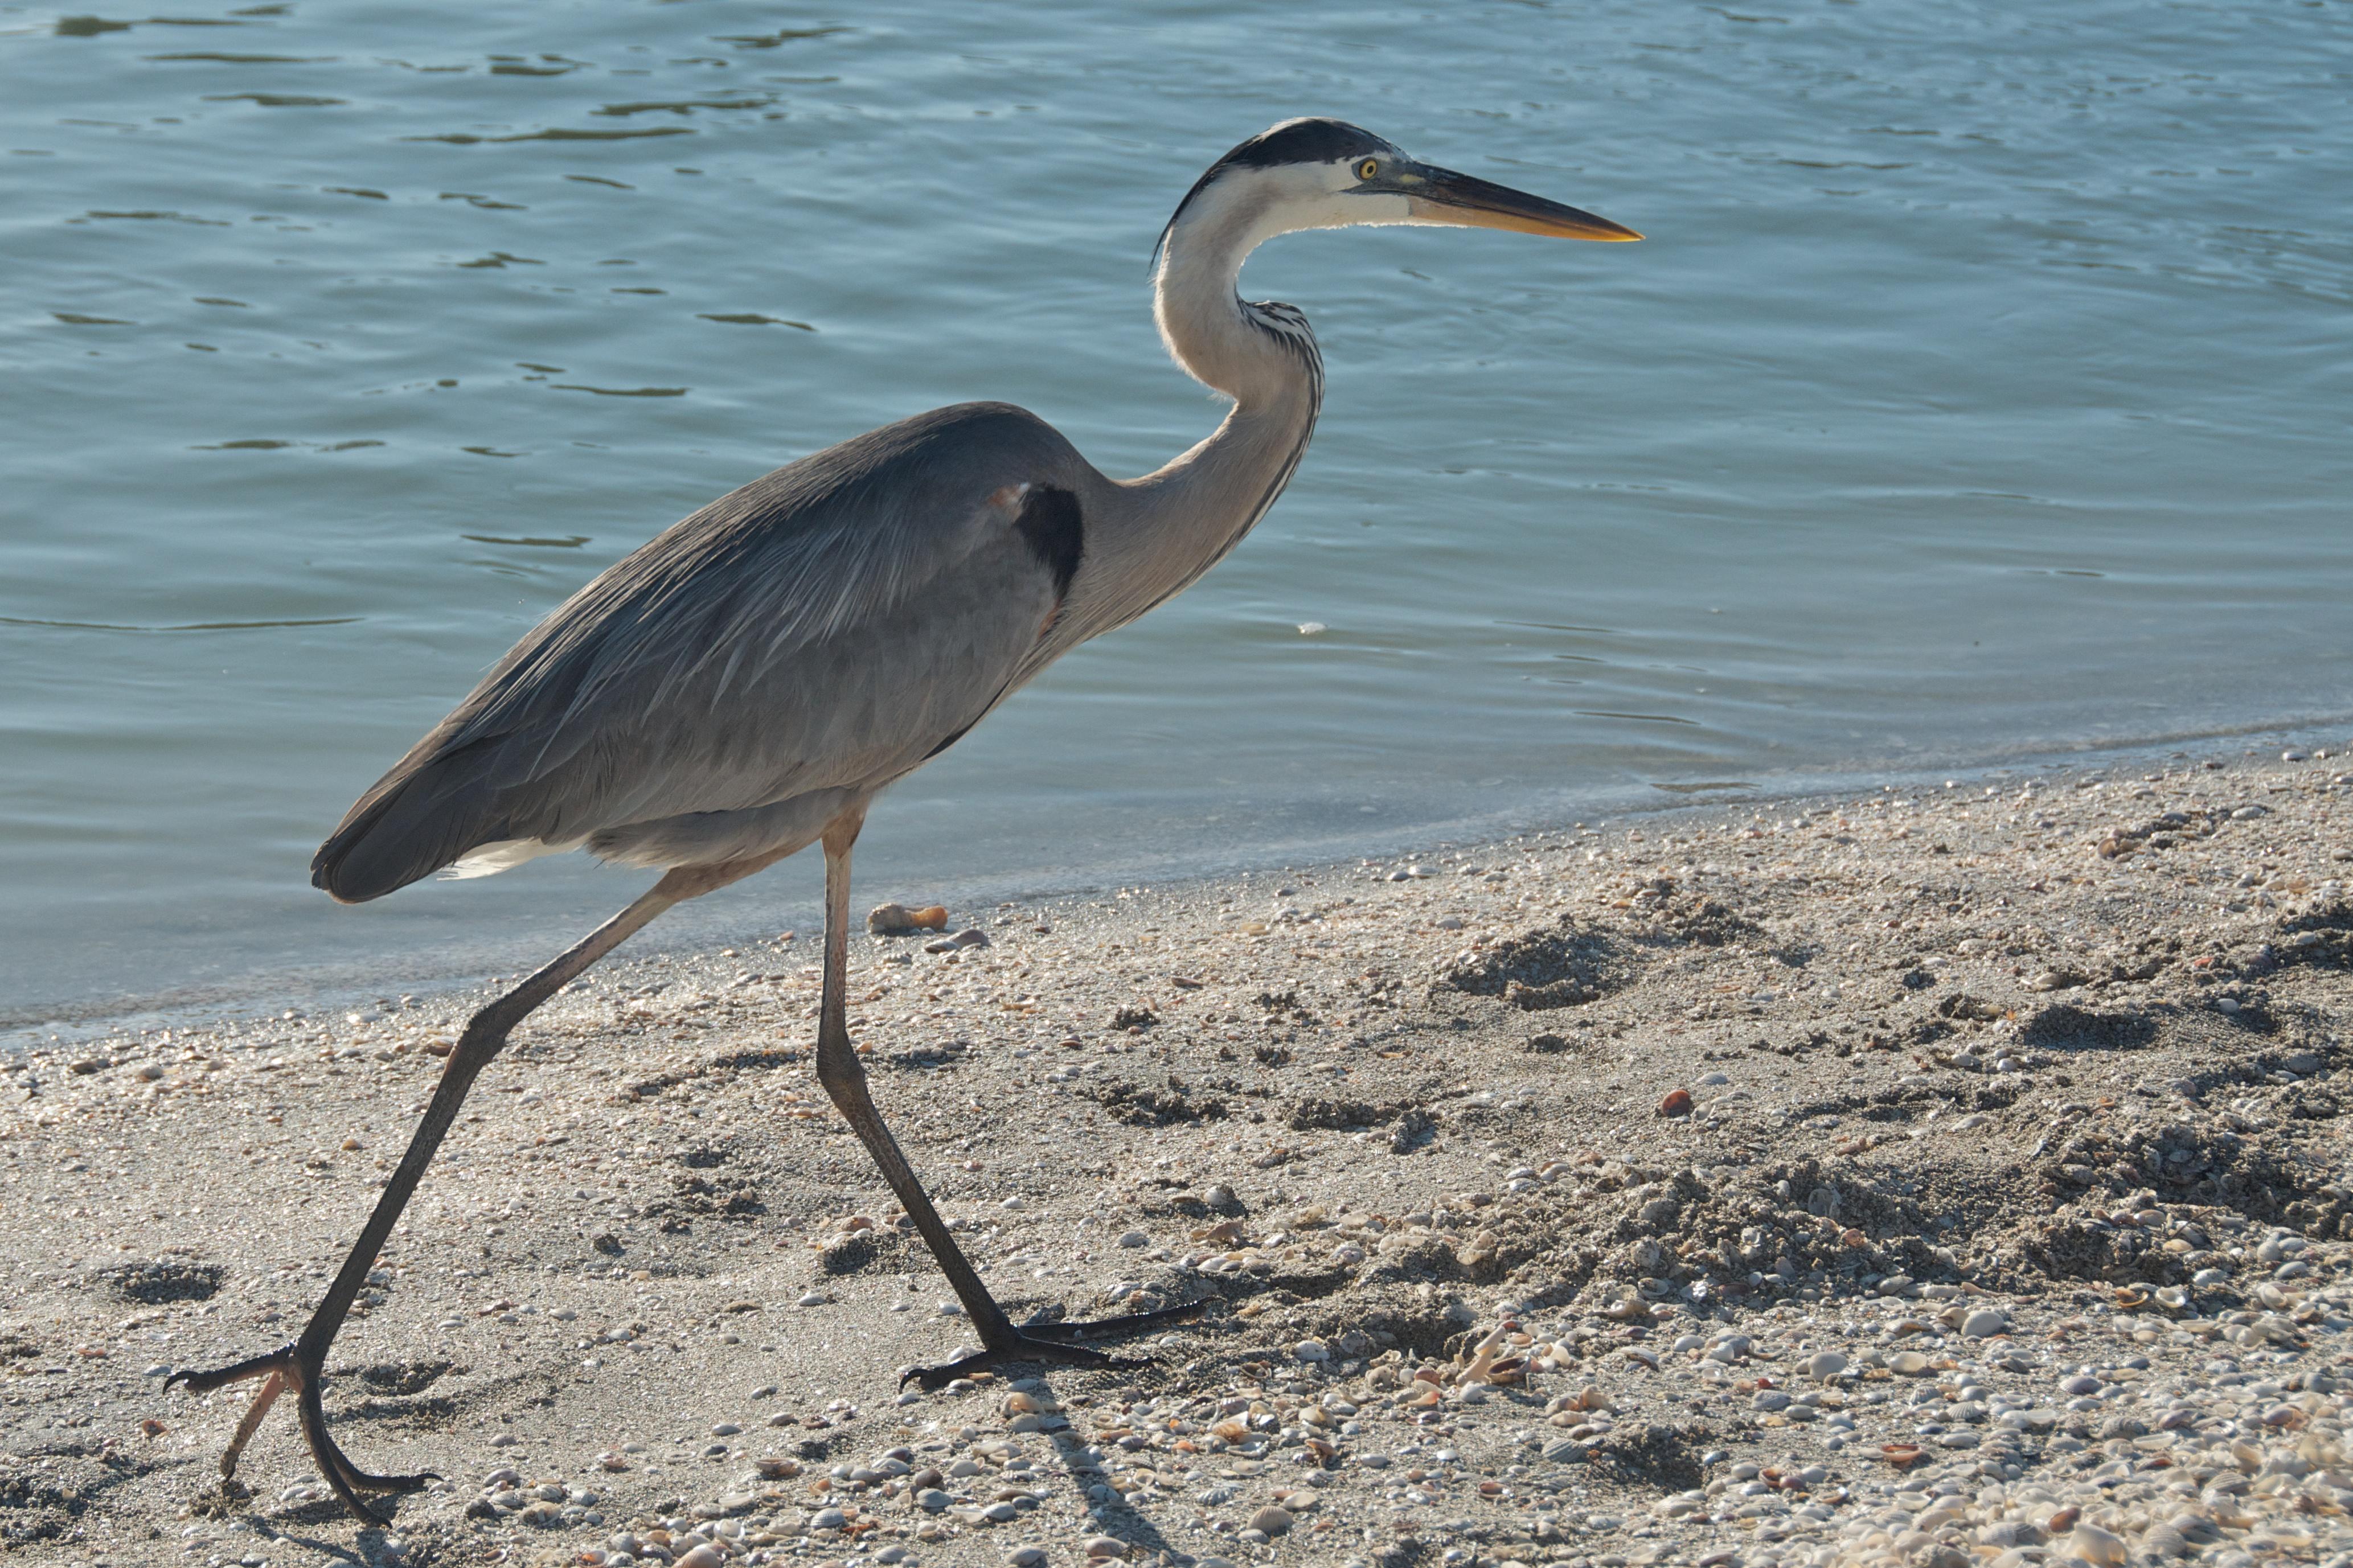 Sanibel Island Florida News